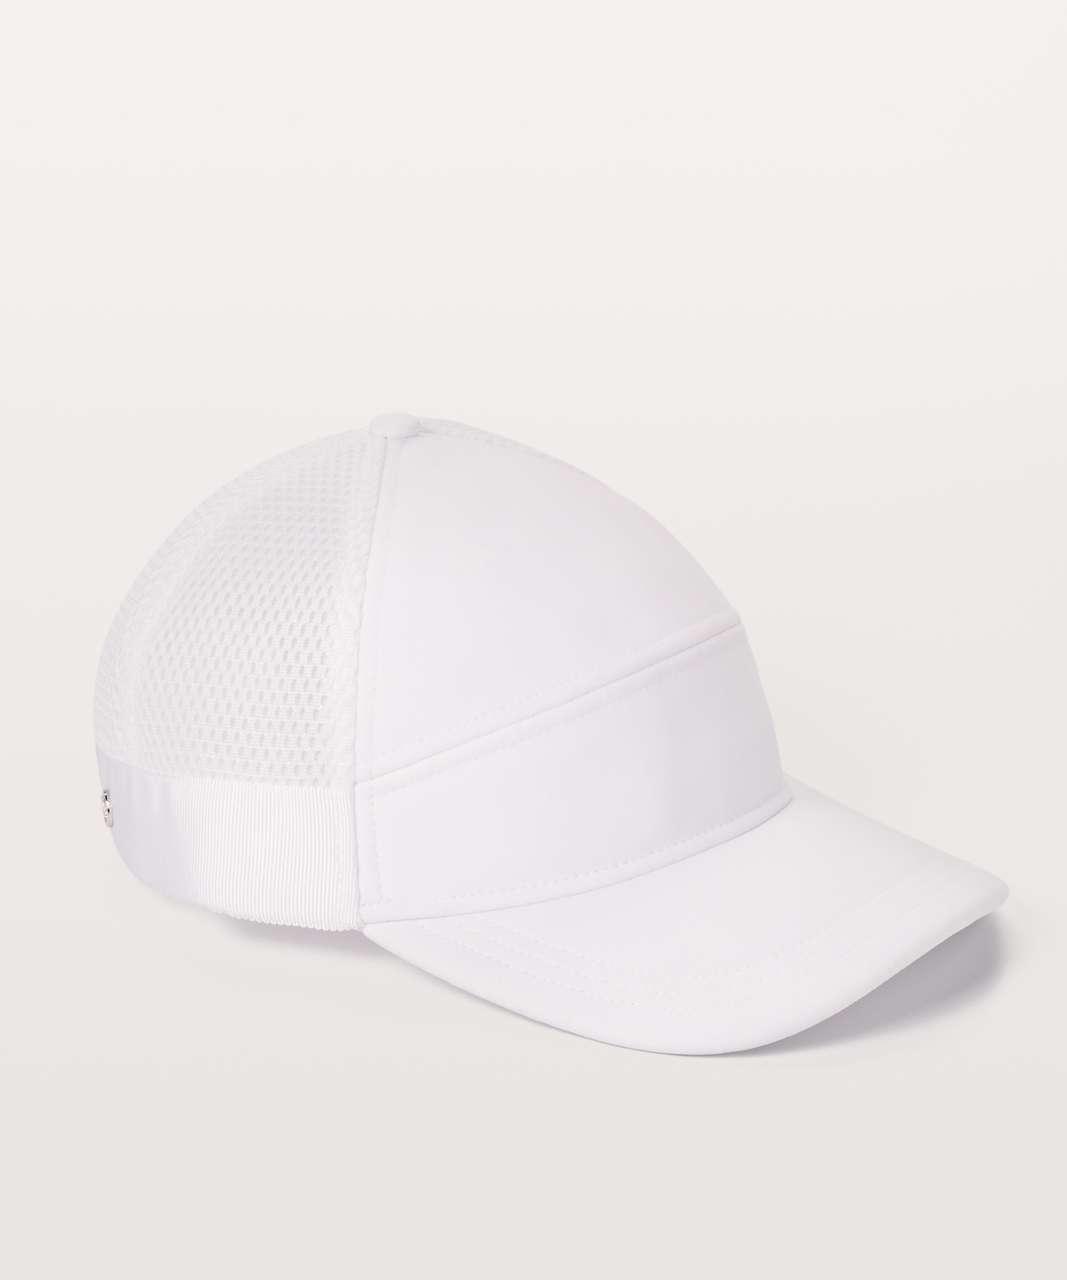 Lululemon Dash & Splash Cap II - White